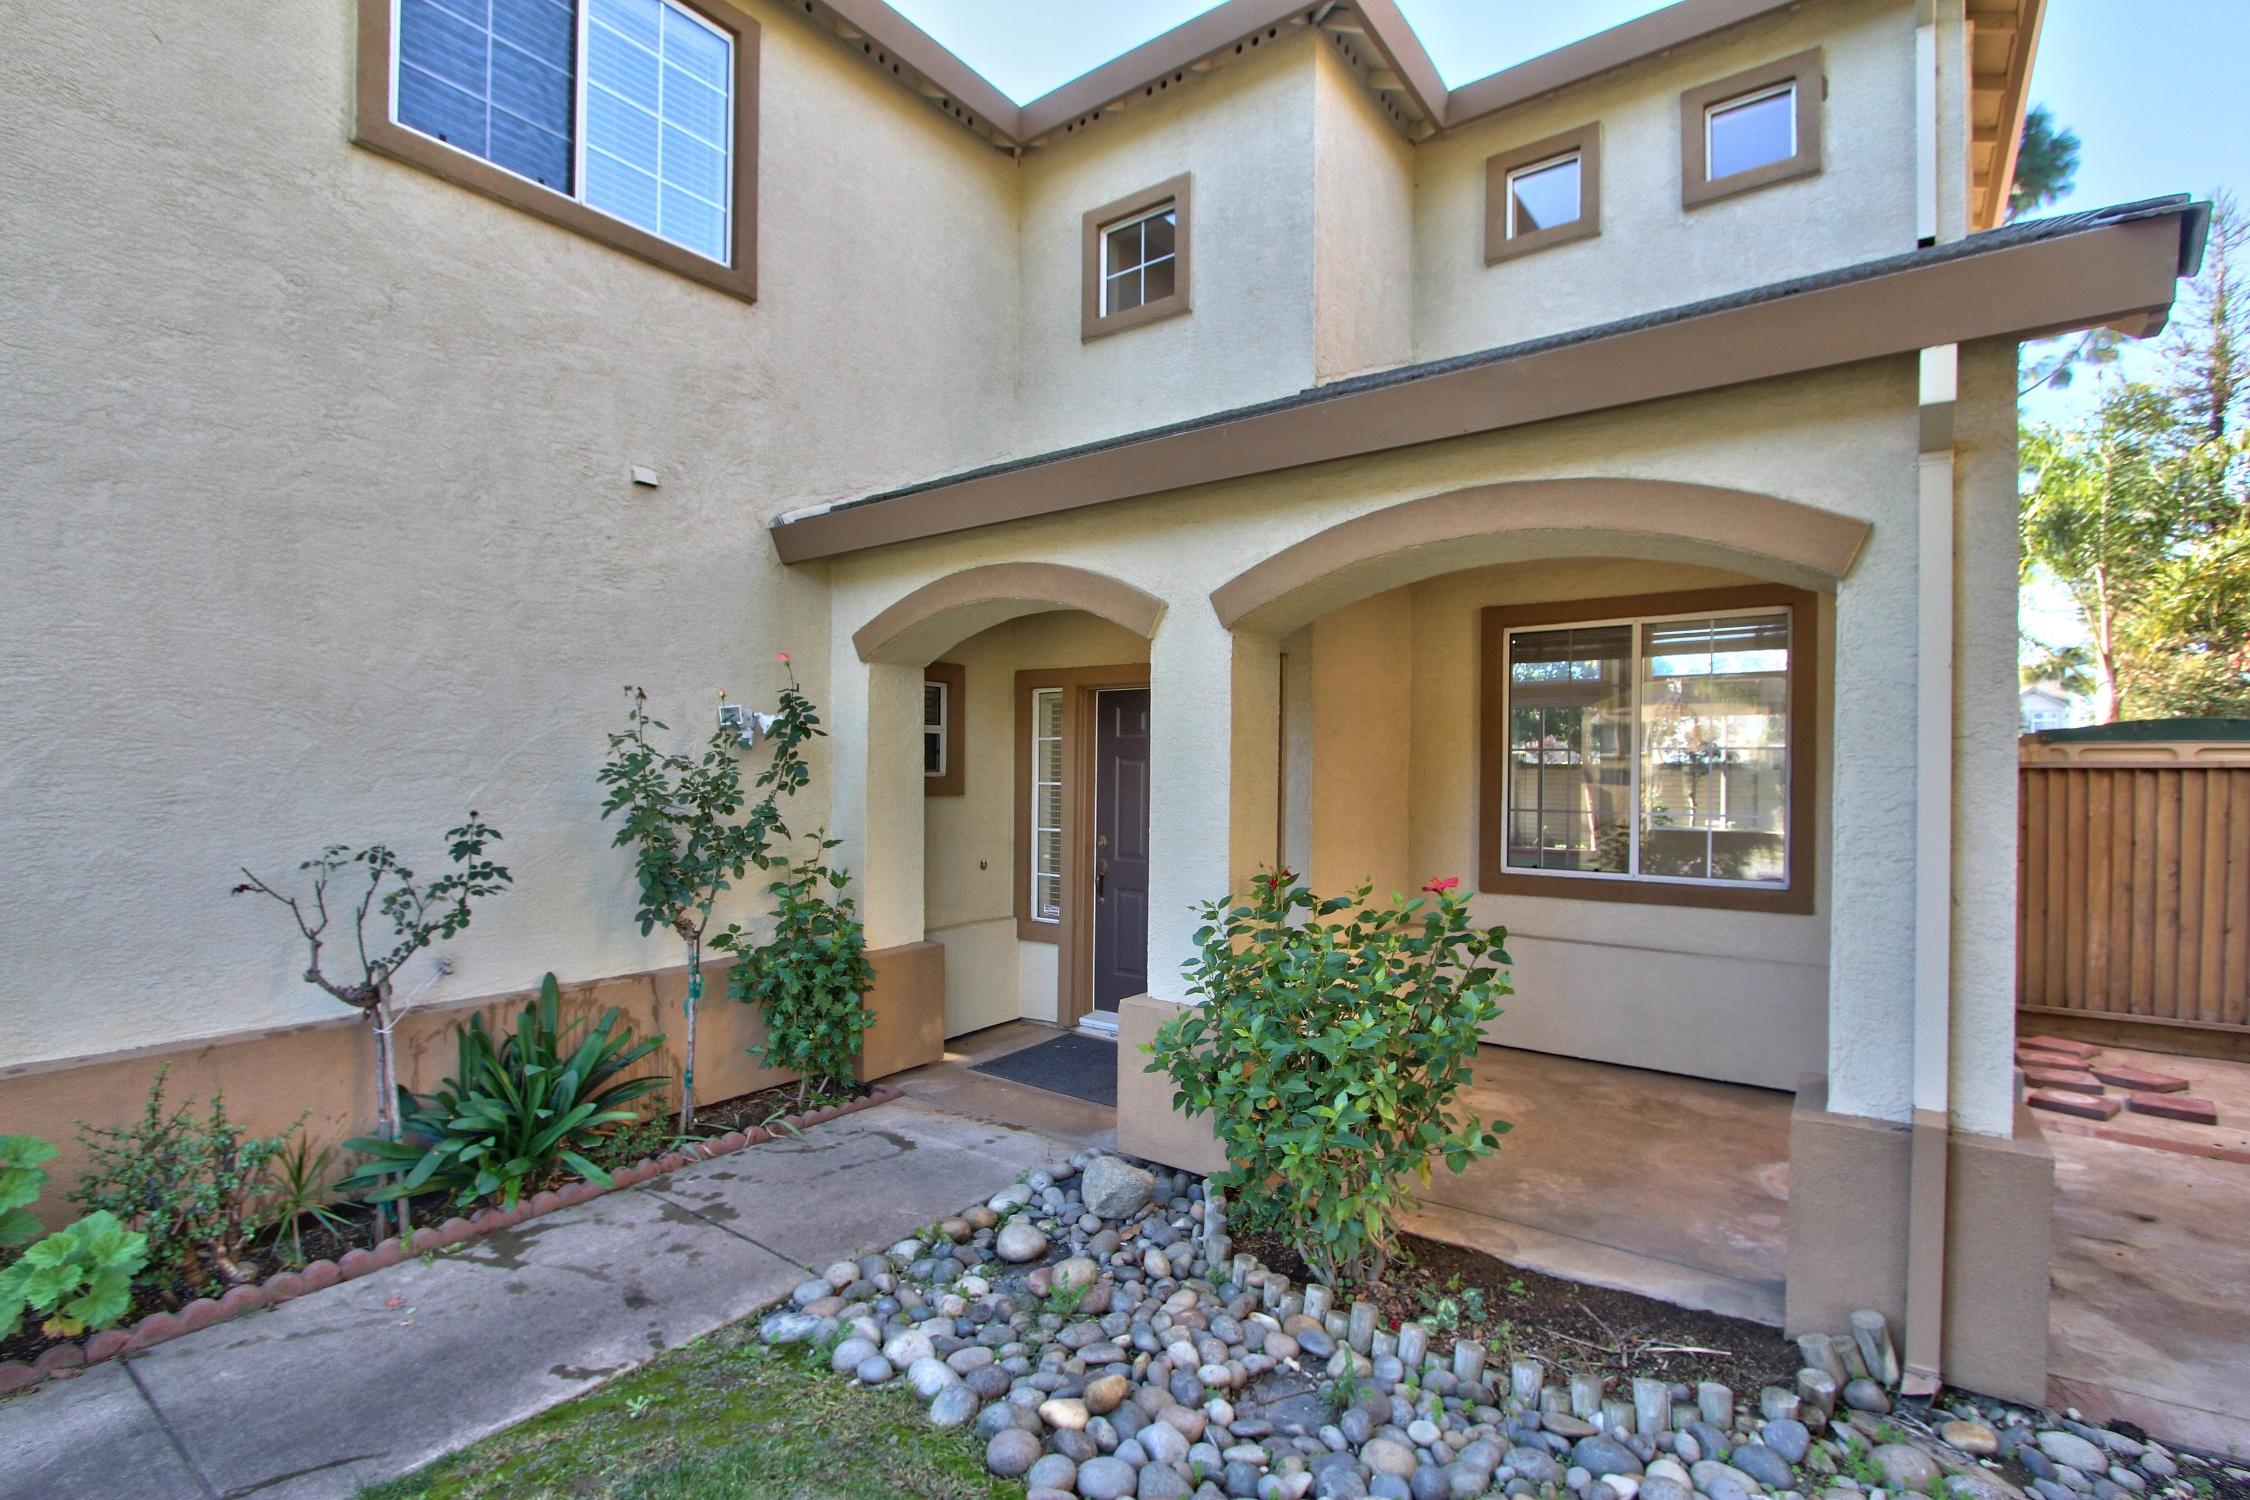 1010 Melville St, Salinas, California 93906